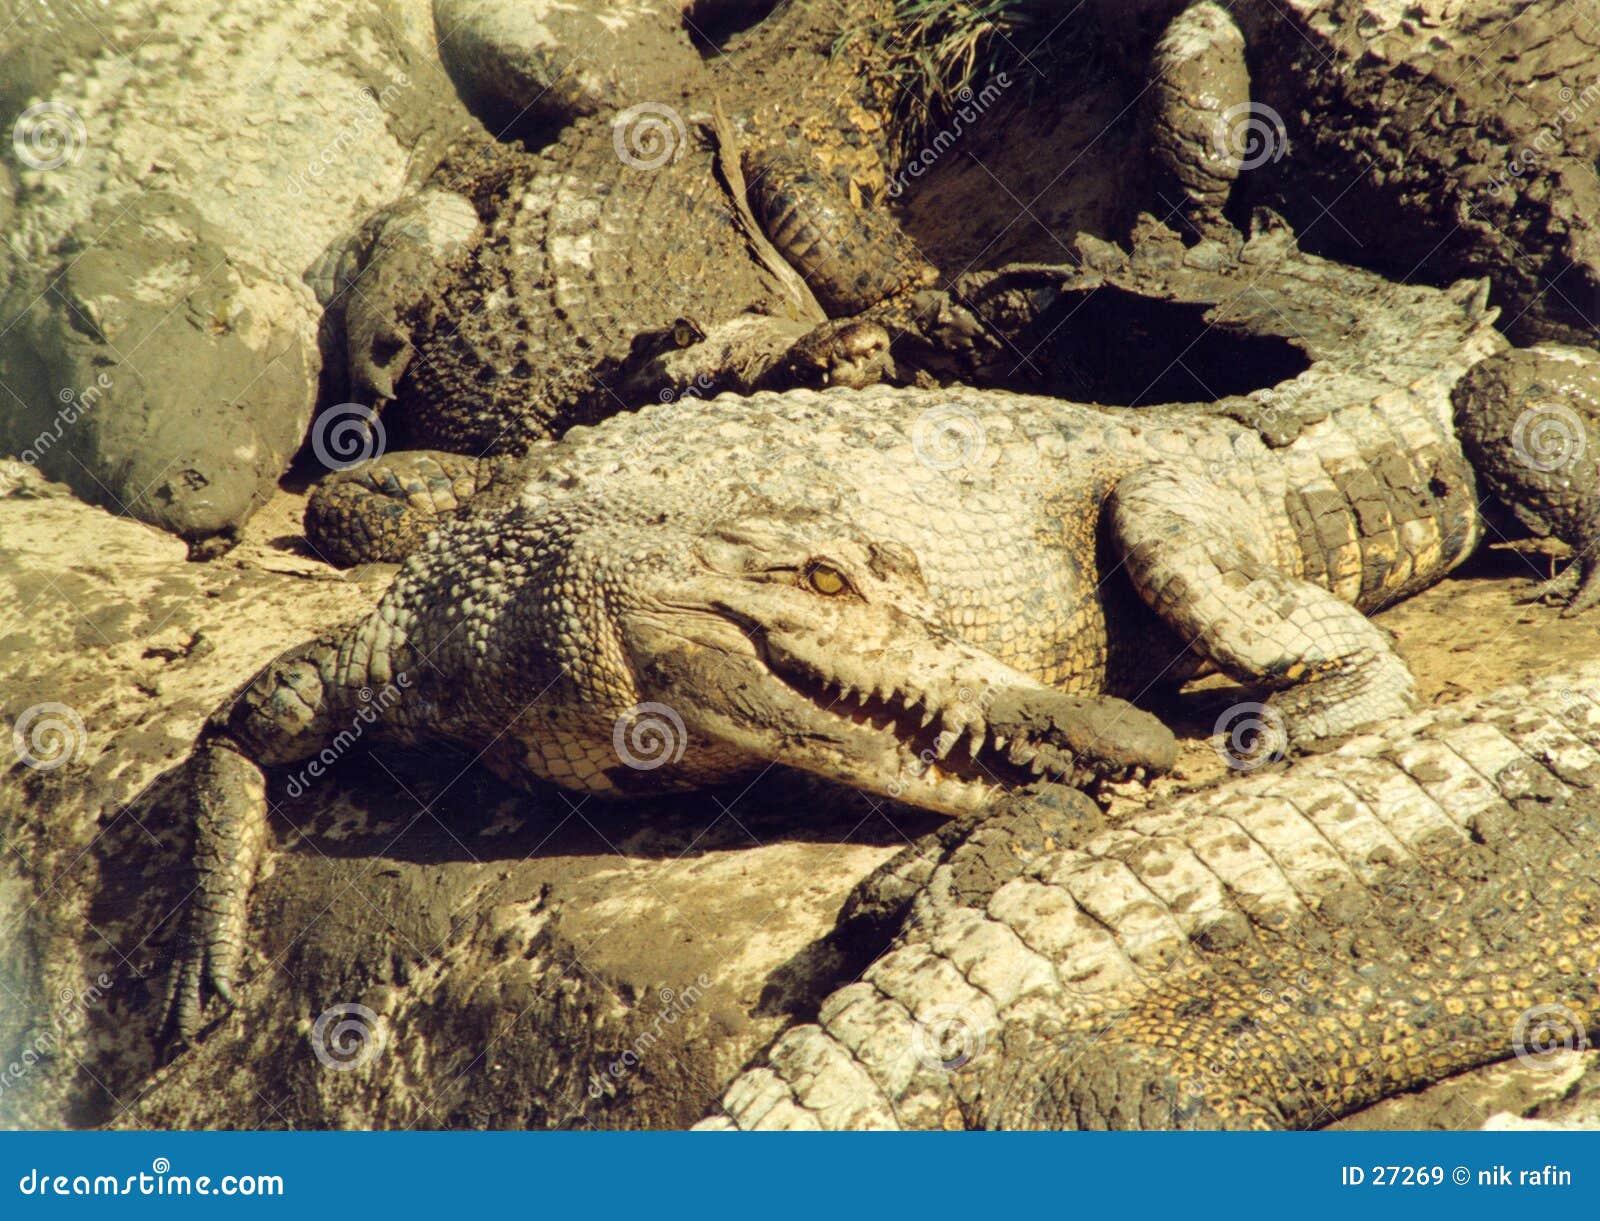 Estuarine krokodil